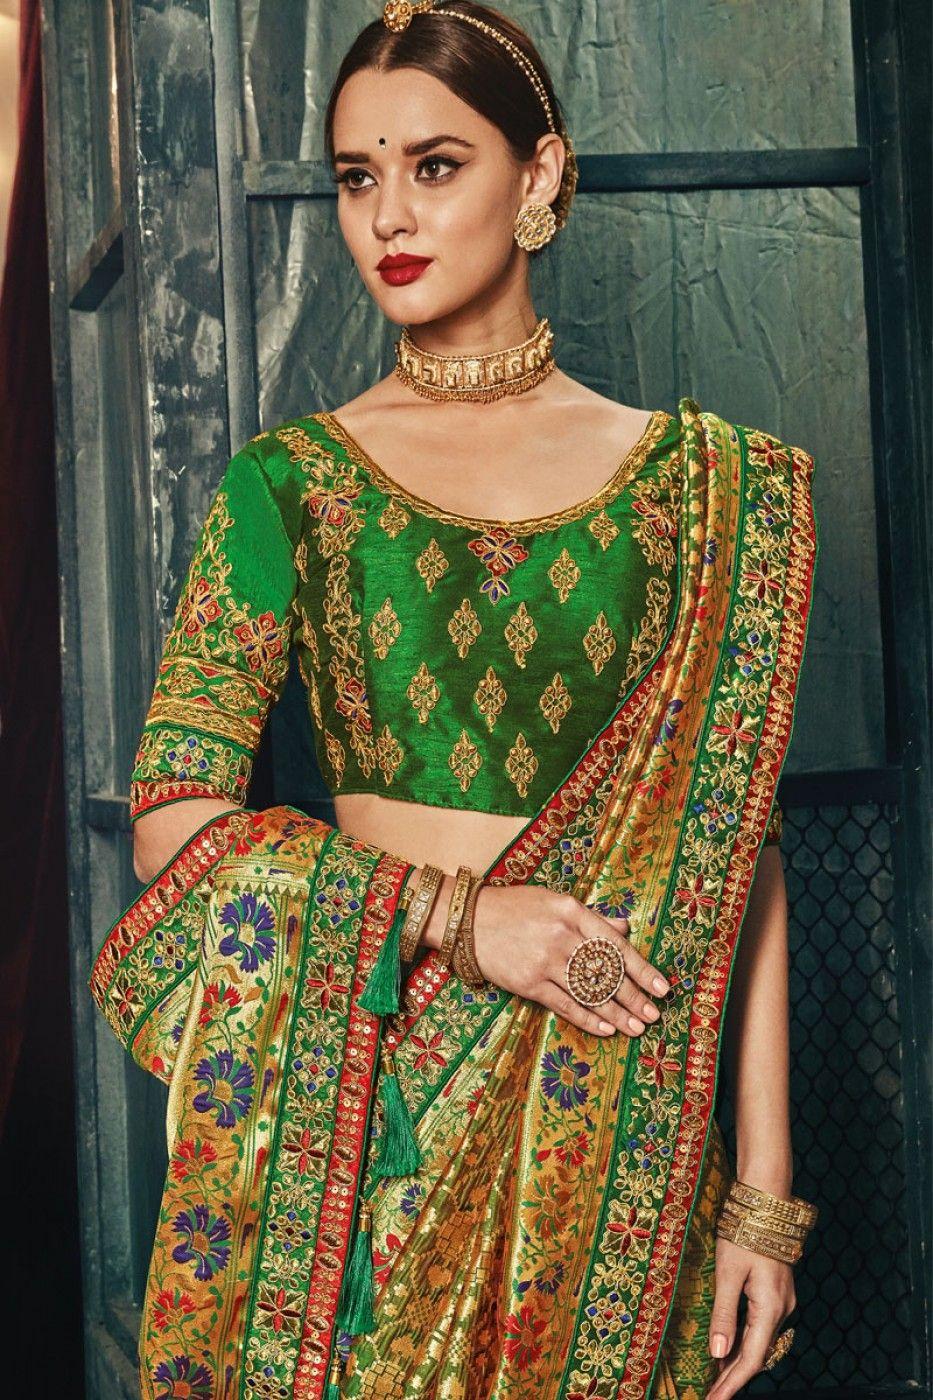 16cecac396f112 Gold   Green Color Banarasi Silk Fabric Heavy Floral Embroidery Work Indian Wedding  Wear Traditional Designer Saree